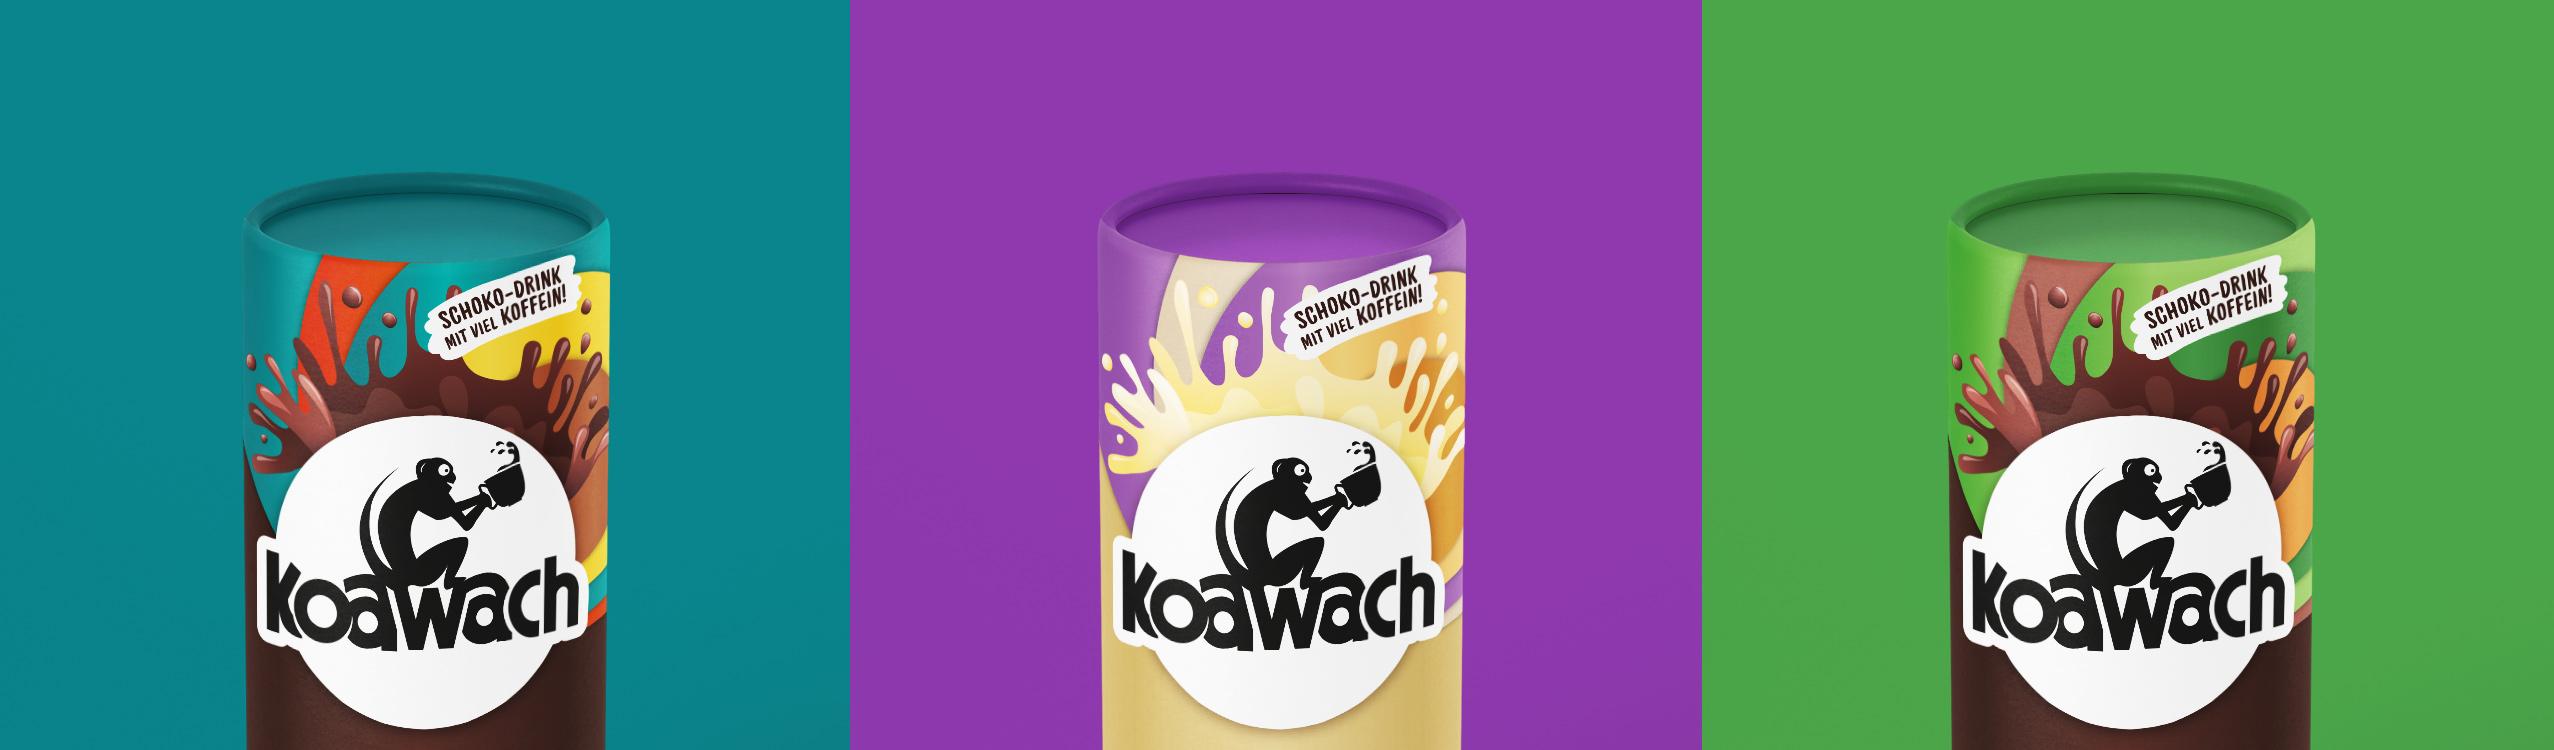 Koawach_TOP-1